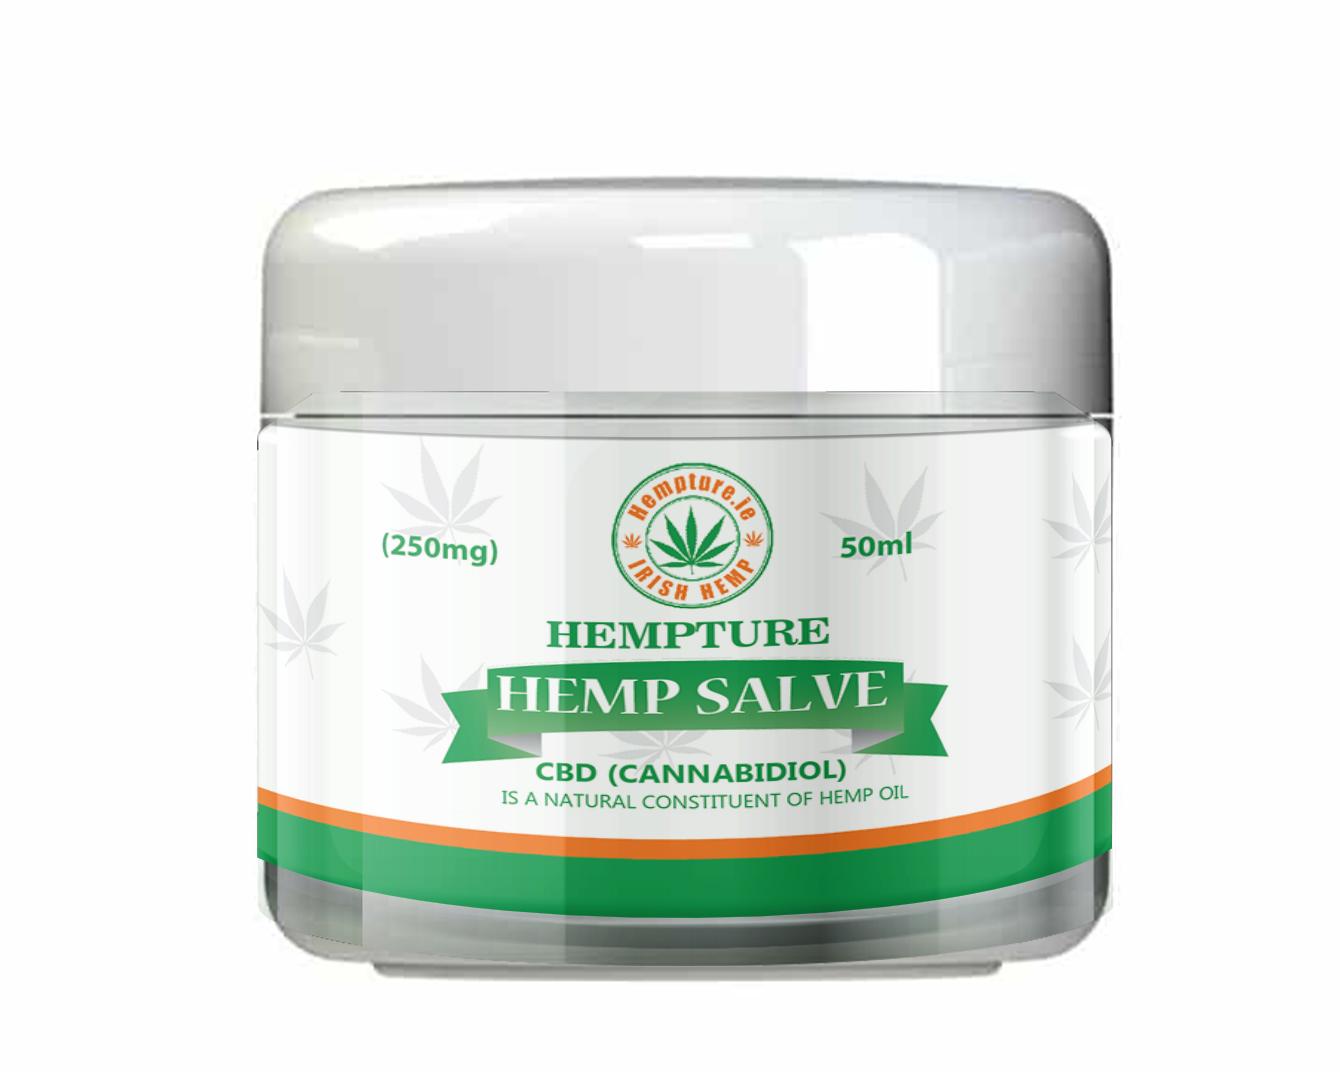 hempture cbd balm hemp salve-250mg pure cannabidiol 50ml